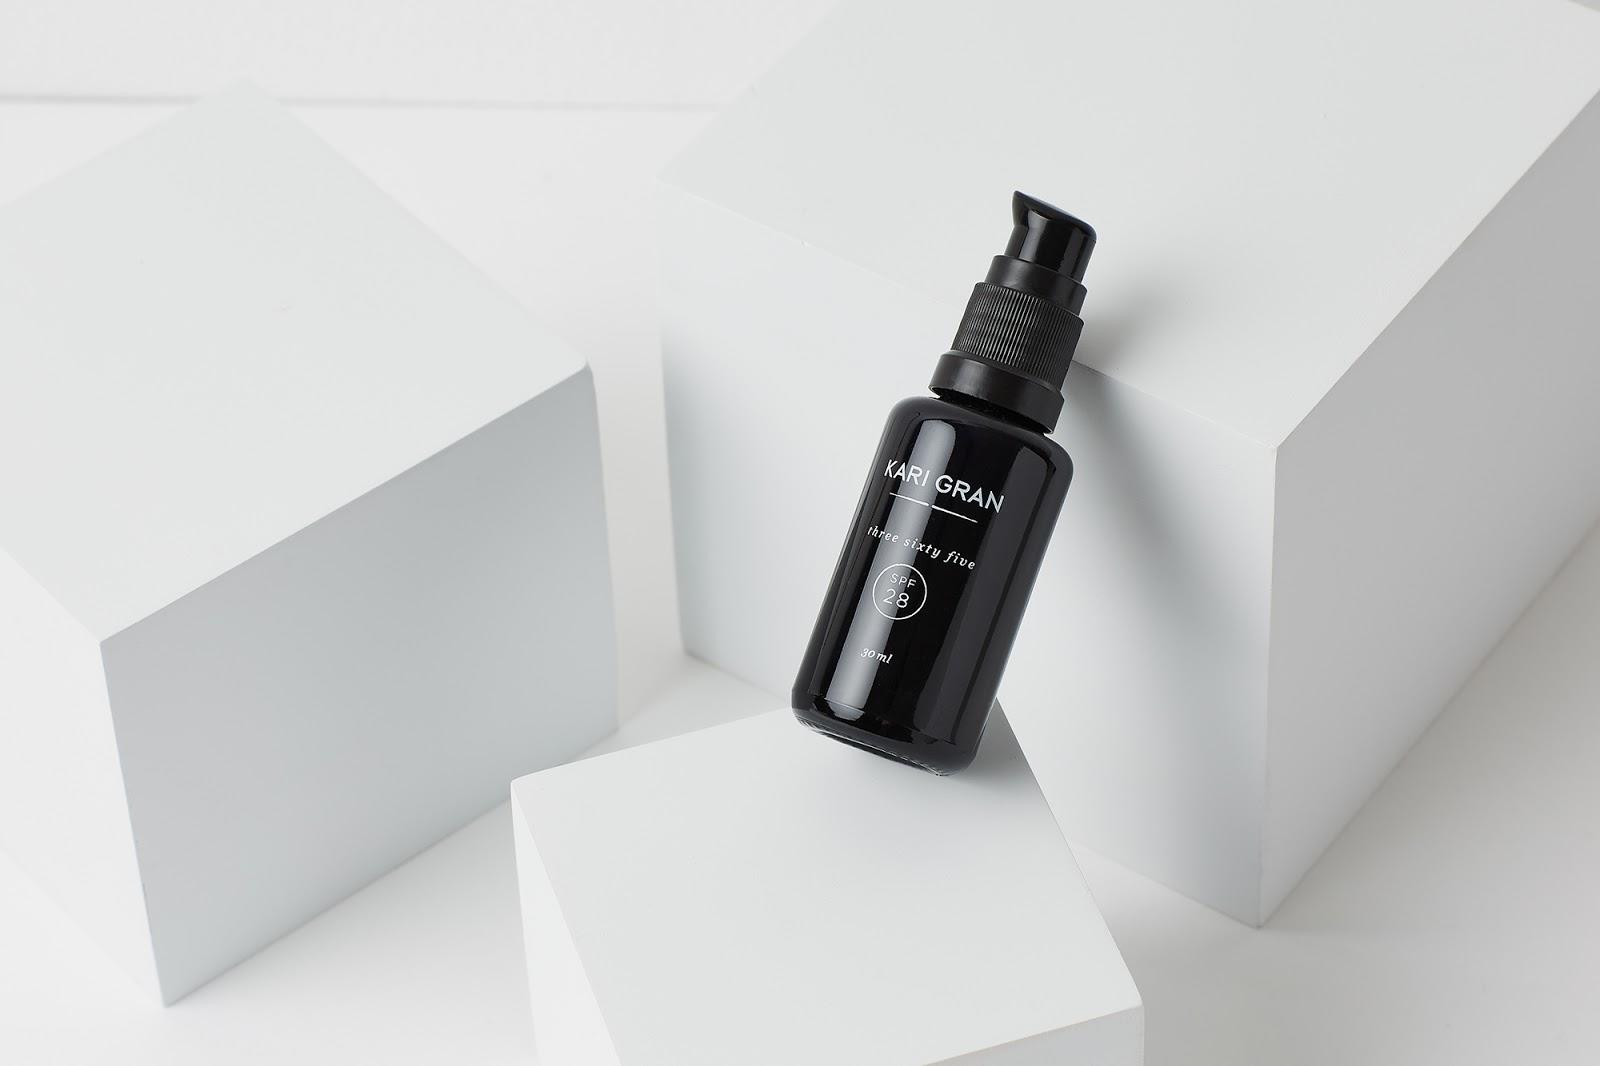 Kari Gran Three Sixty Five SPF 28 natural organic sunscreen for acne nontoxic hellolindasau linda sau